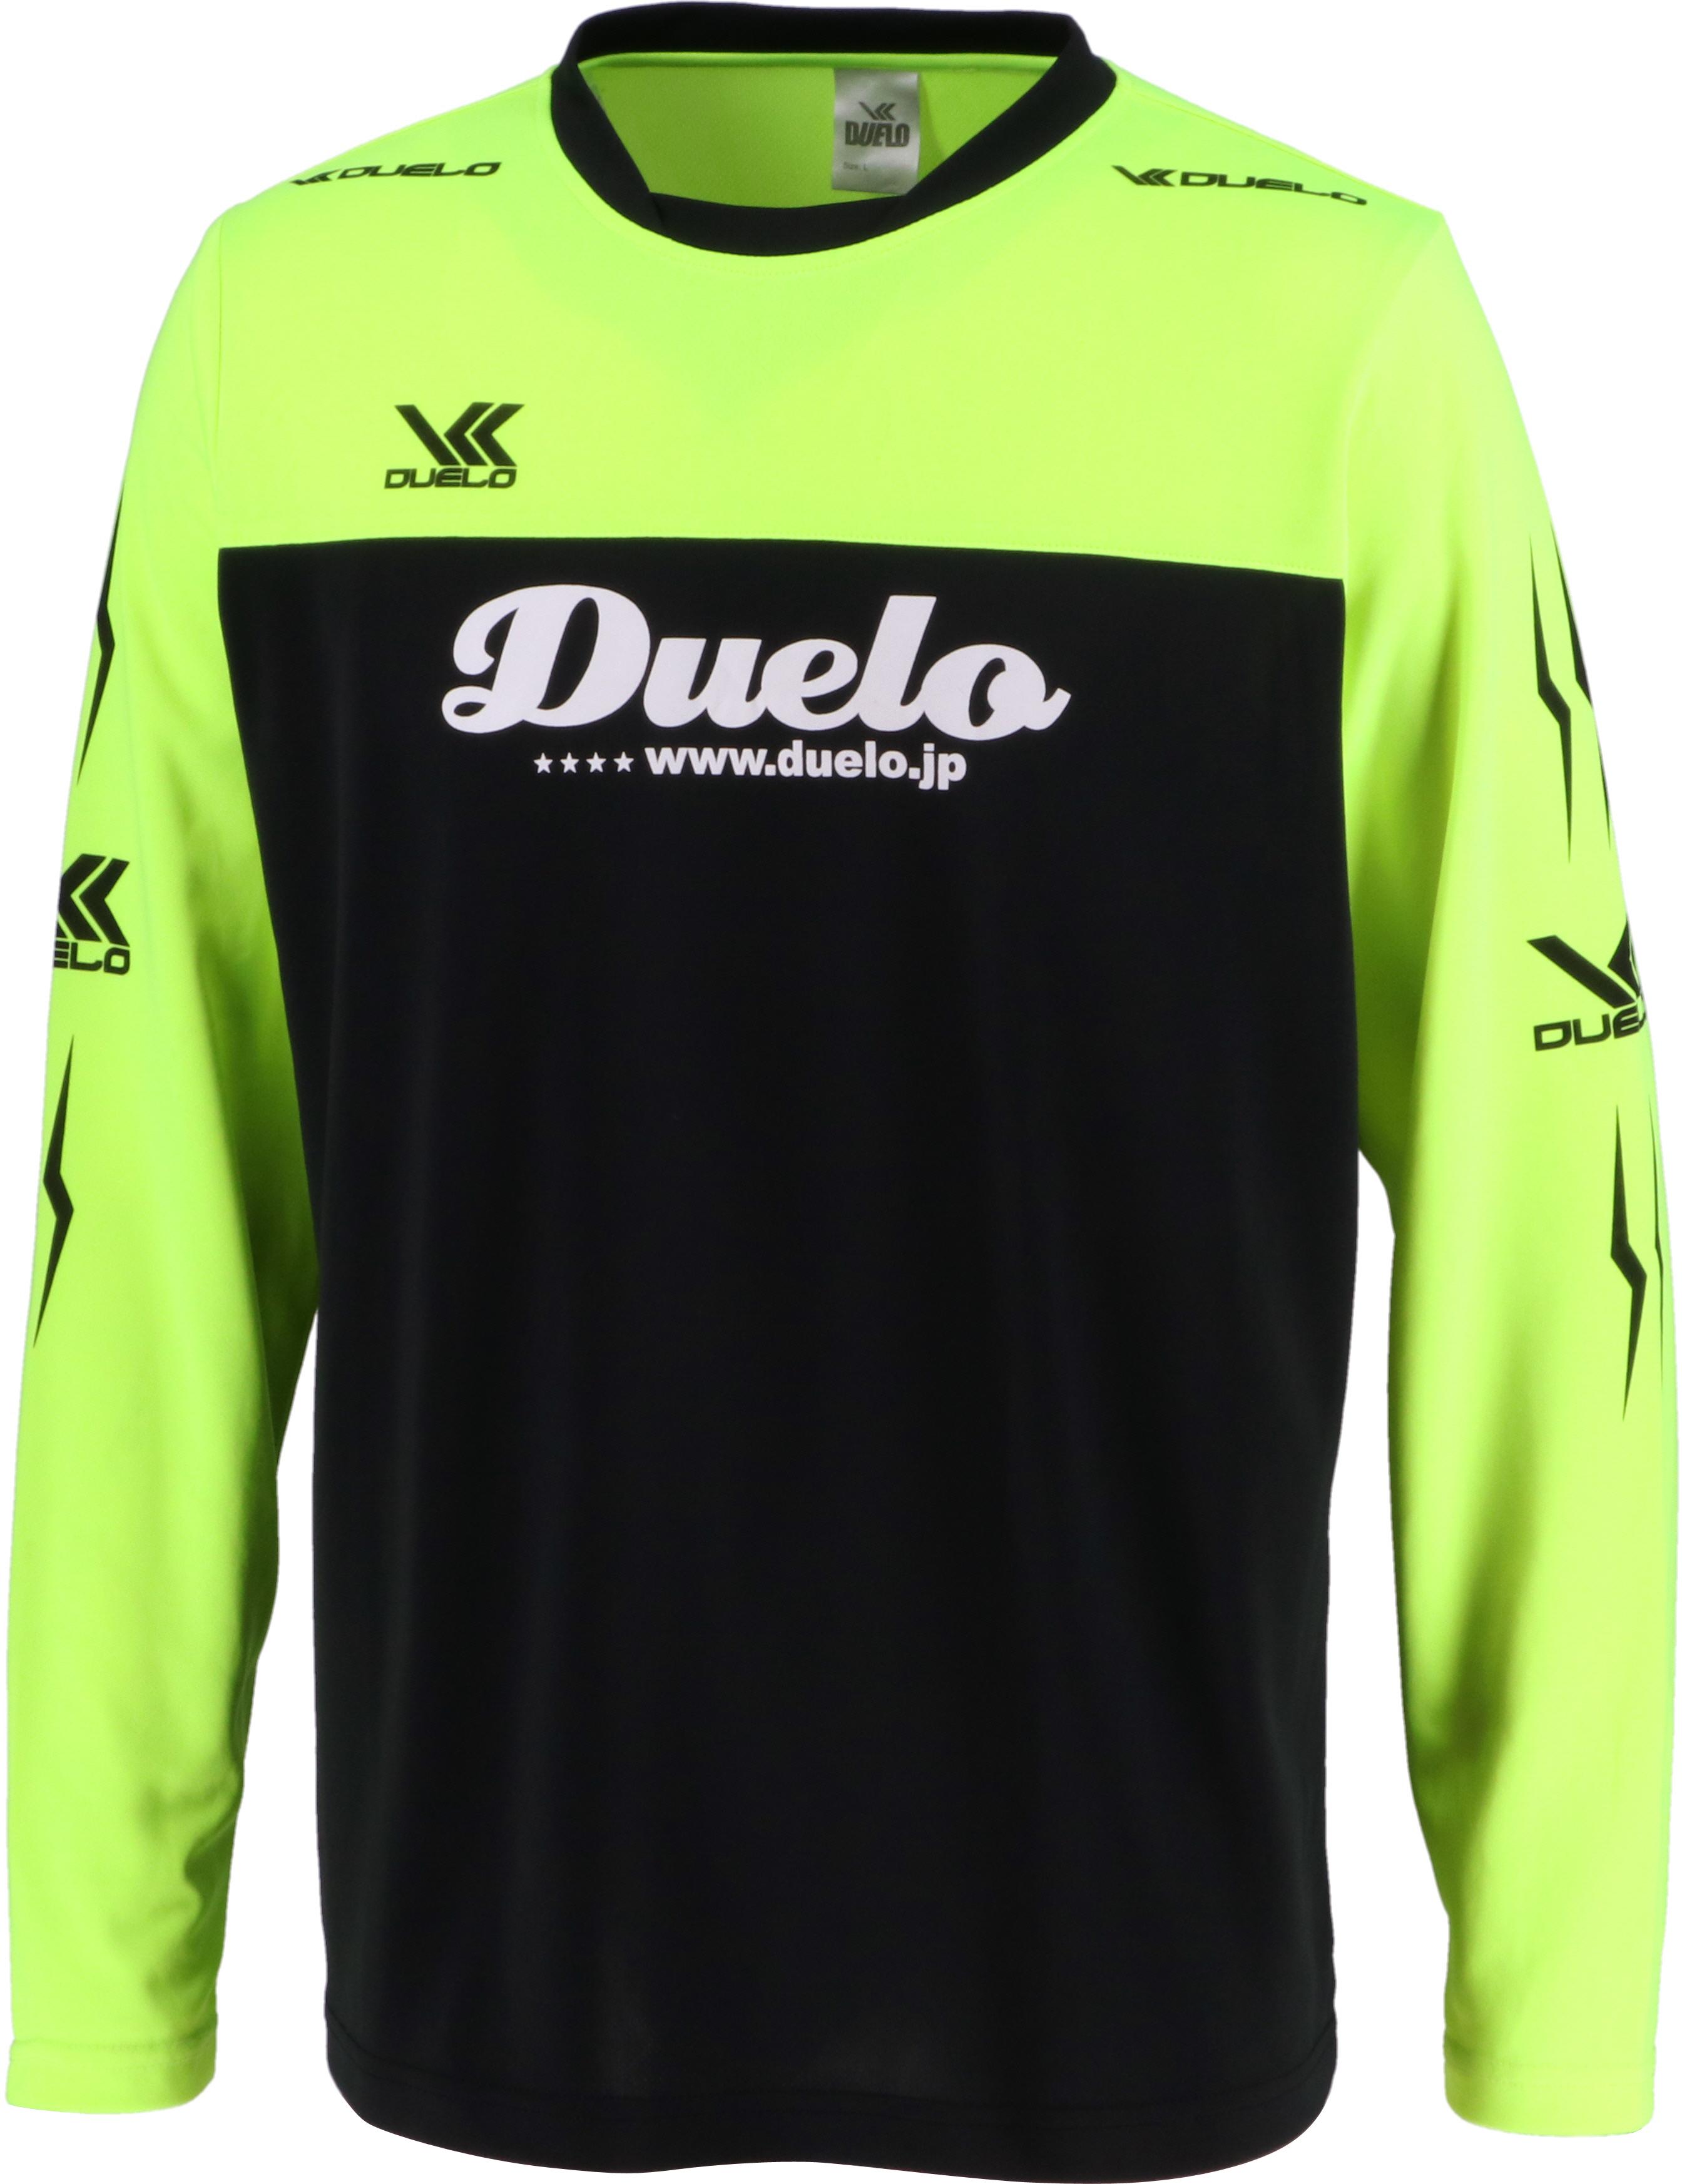 19020 Duelo Logo Long Practice Shirt BLK/蛍光YEL